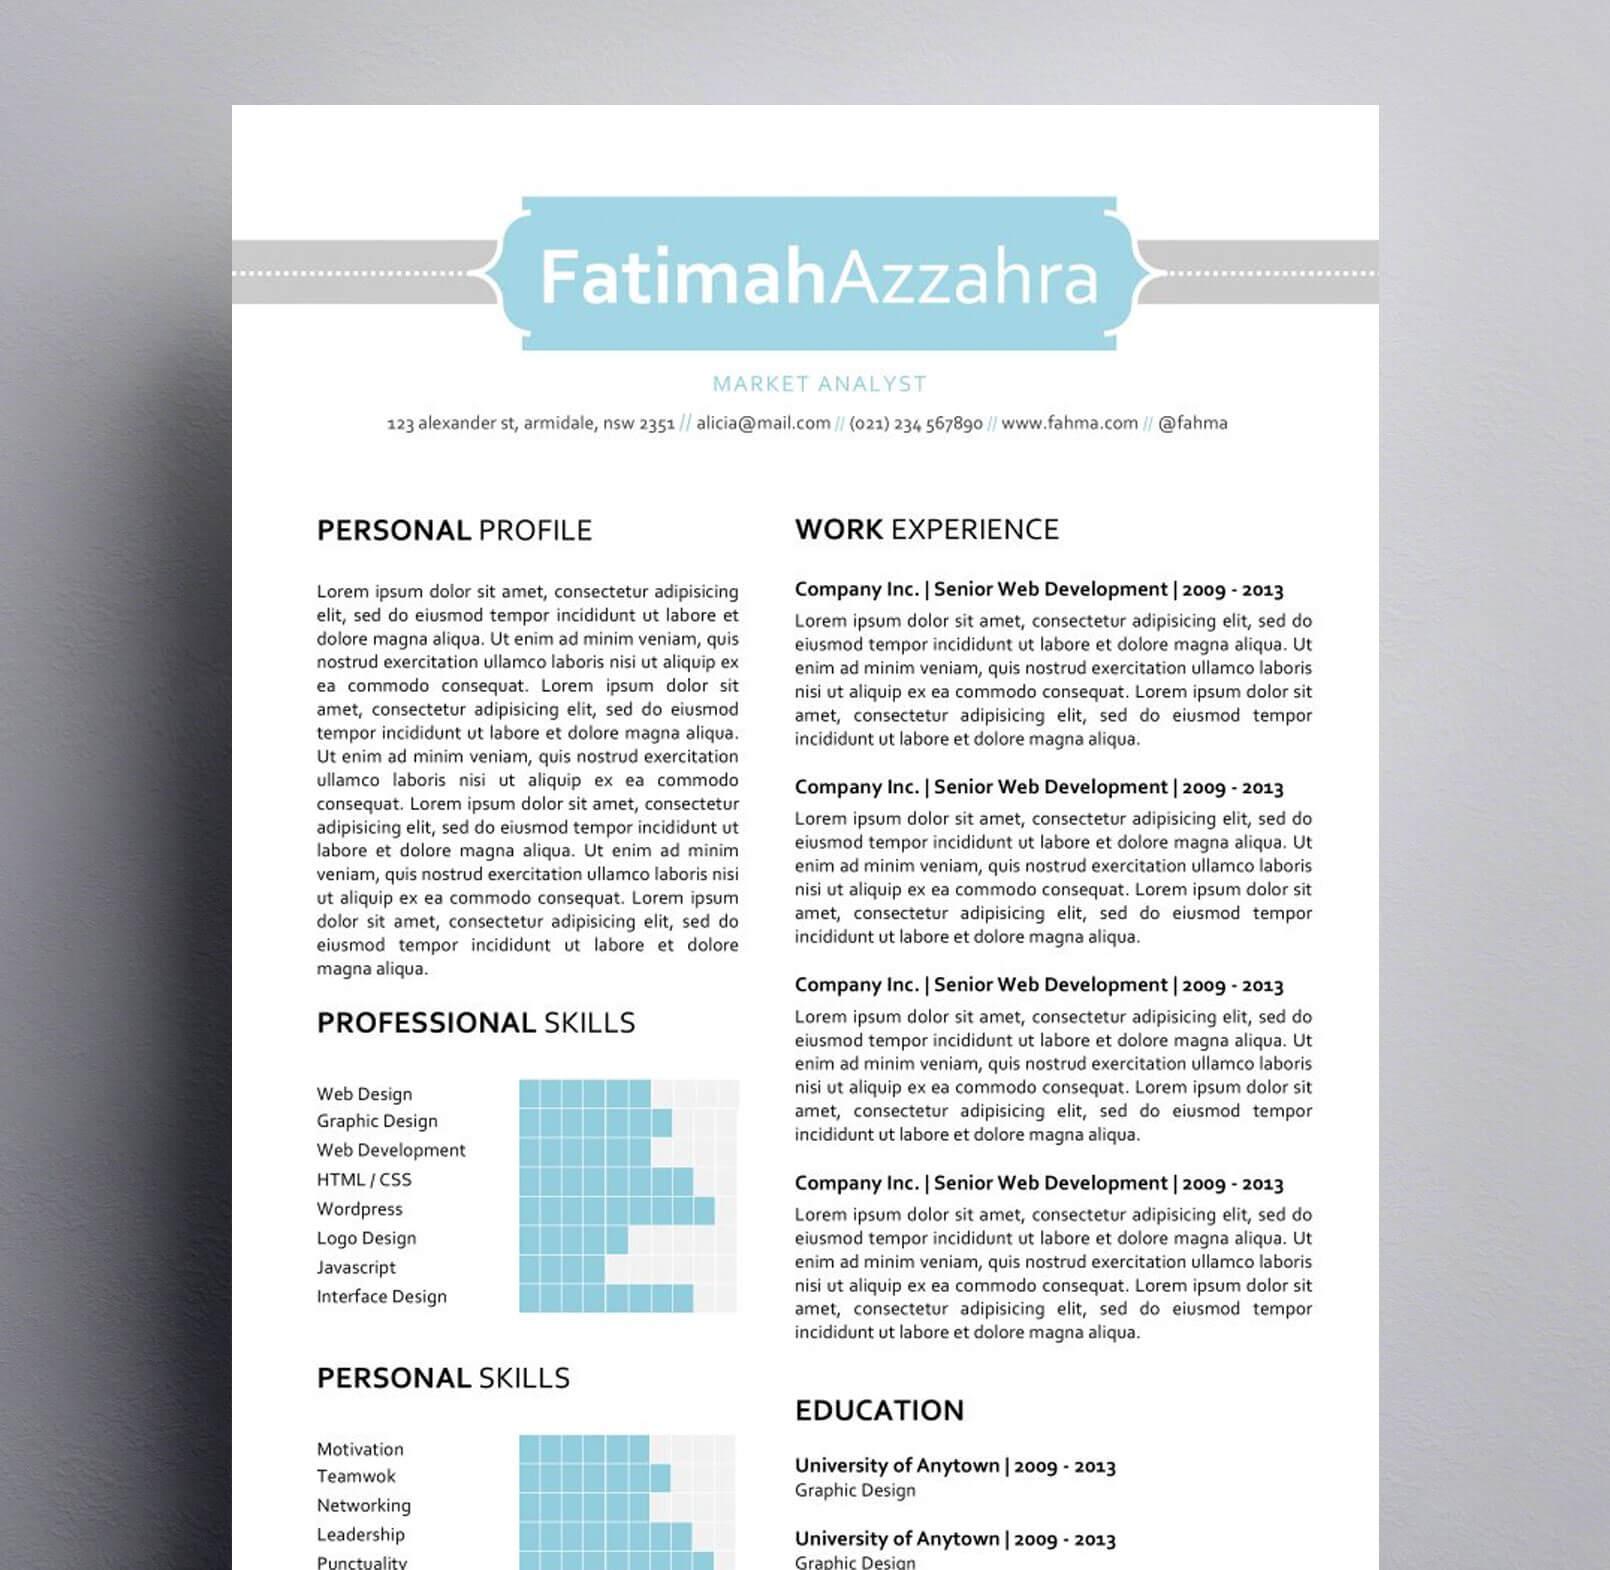 the fatima azzahra resume   kukook